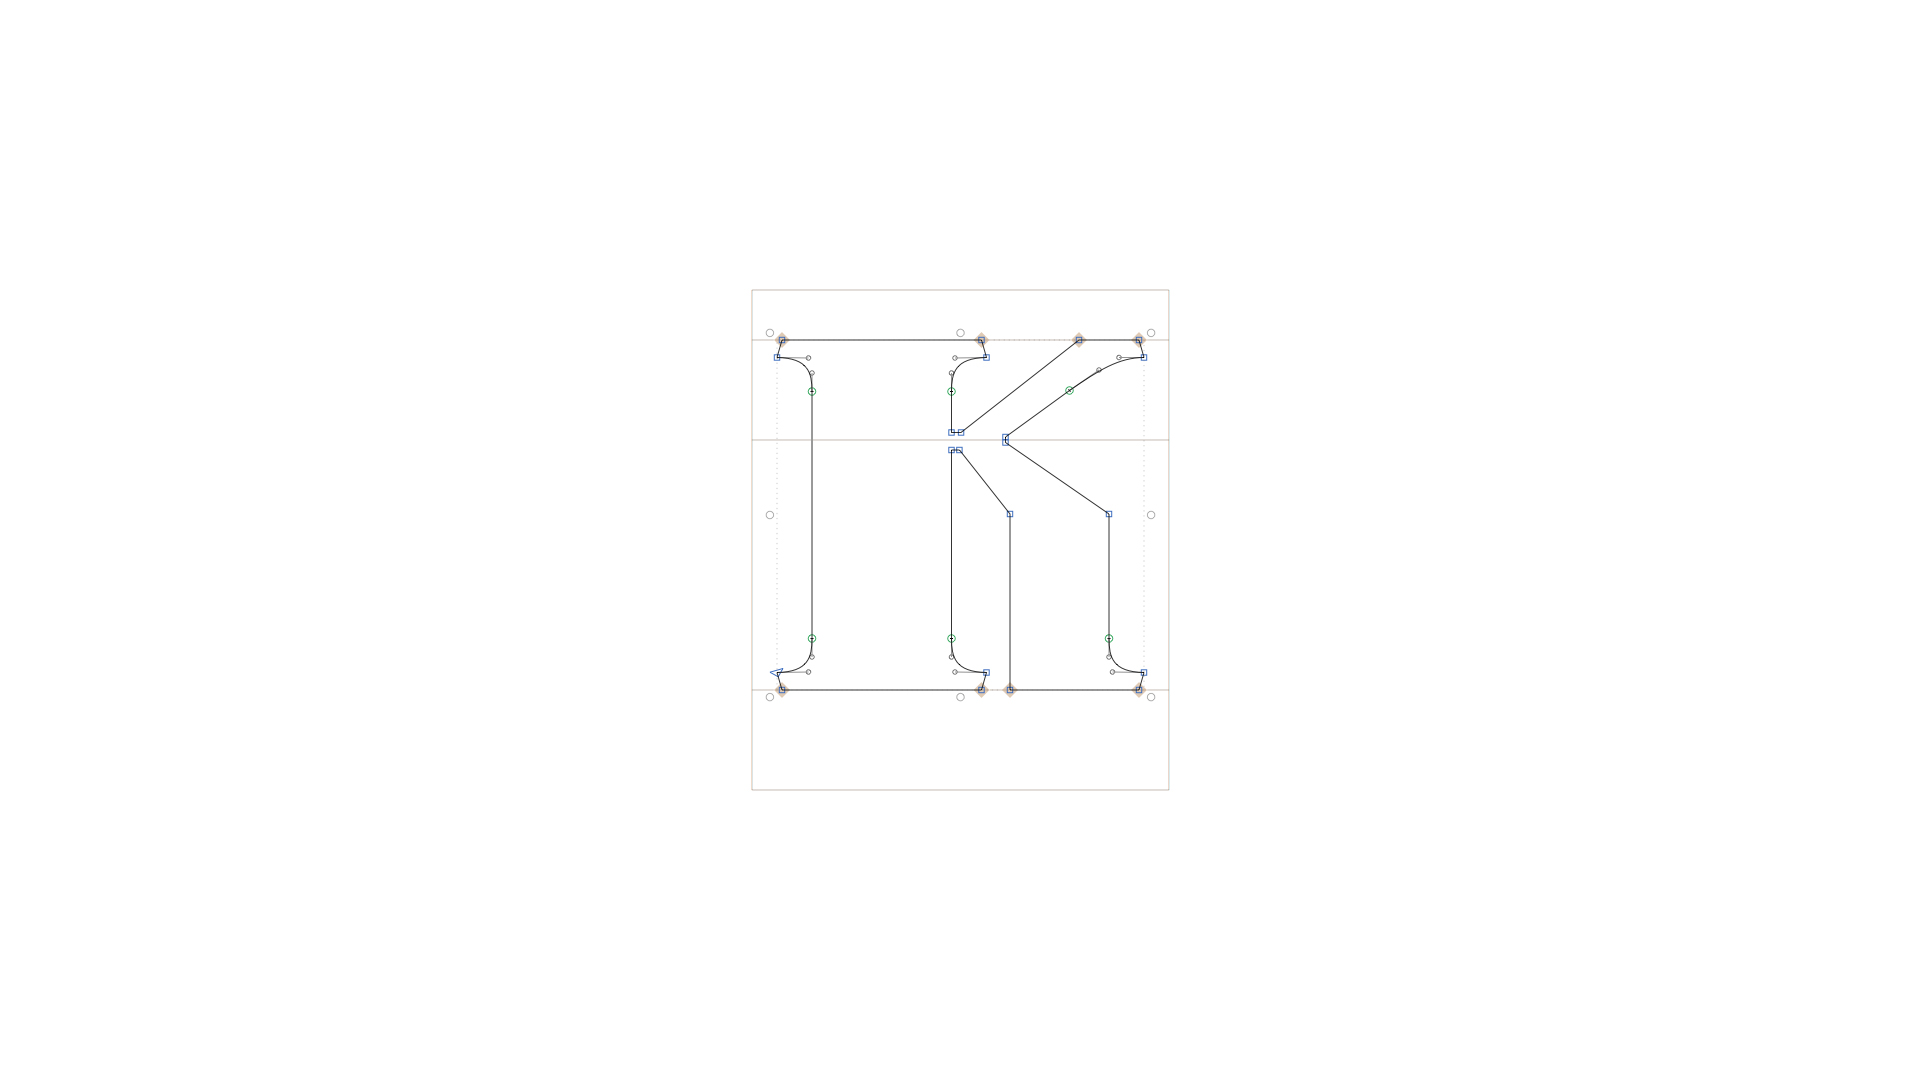 Alejandro-Torres-Cholo-black-ttf-Display-K.jpg